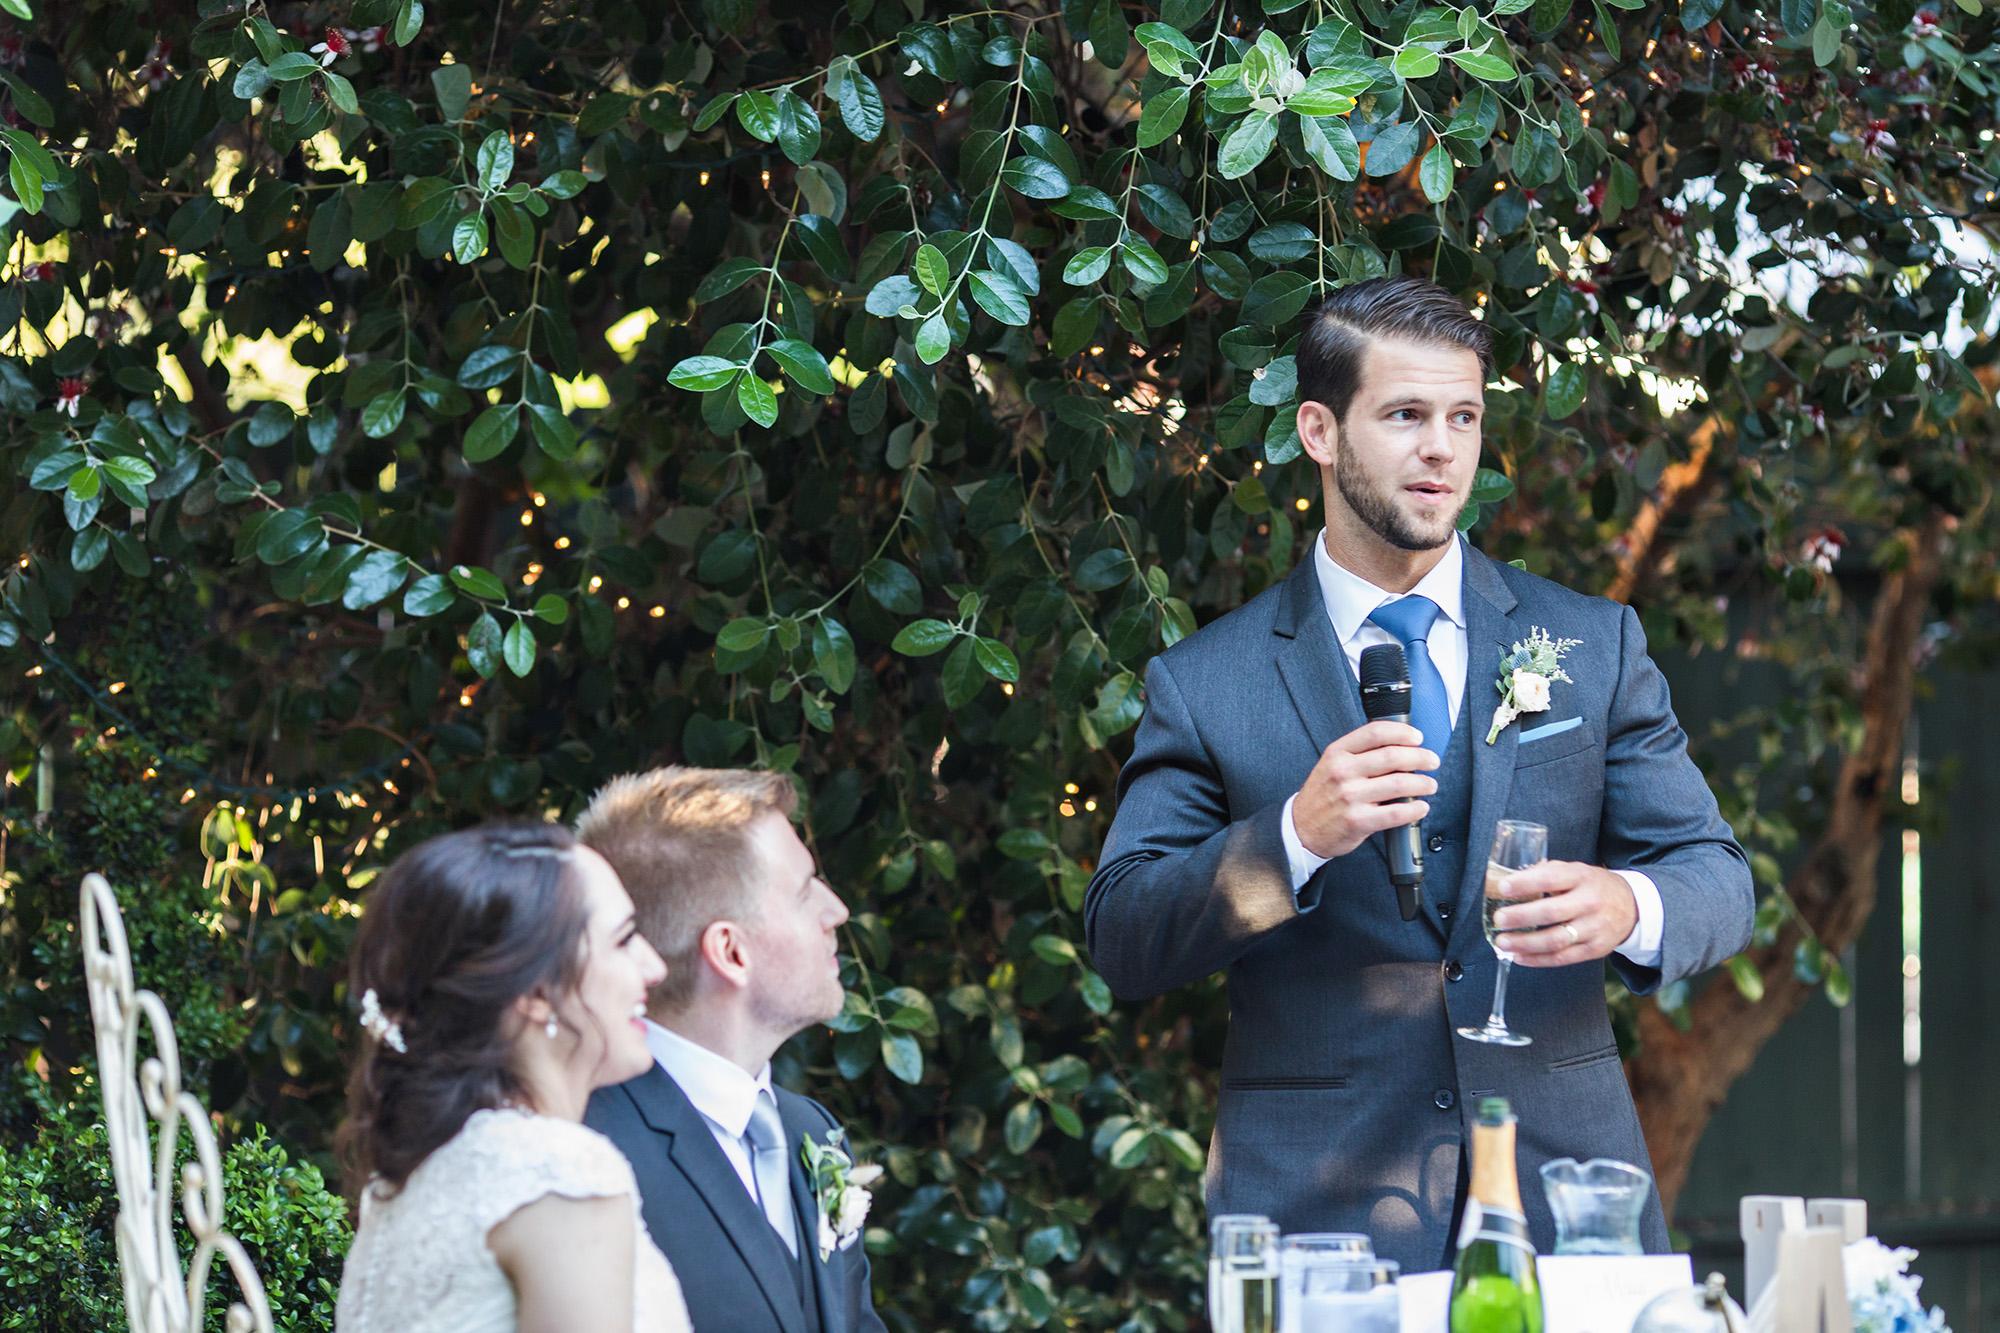 associate-photographer-christmas-house-wedding-carrie-vines-0057.jpg